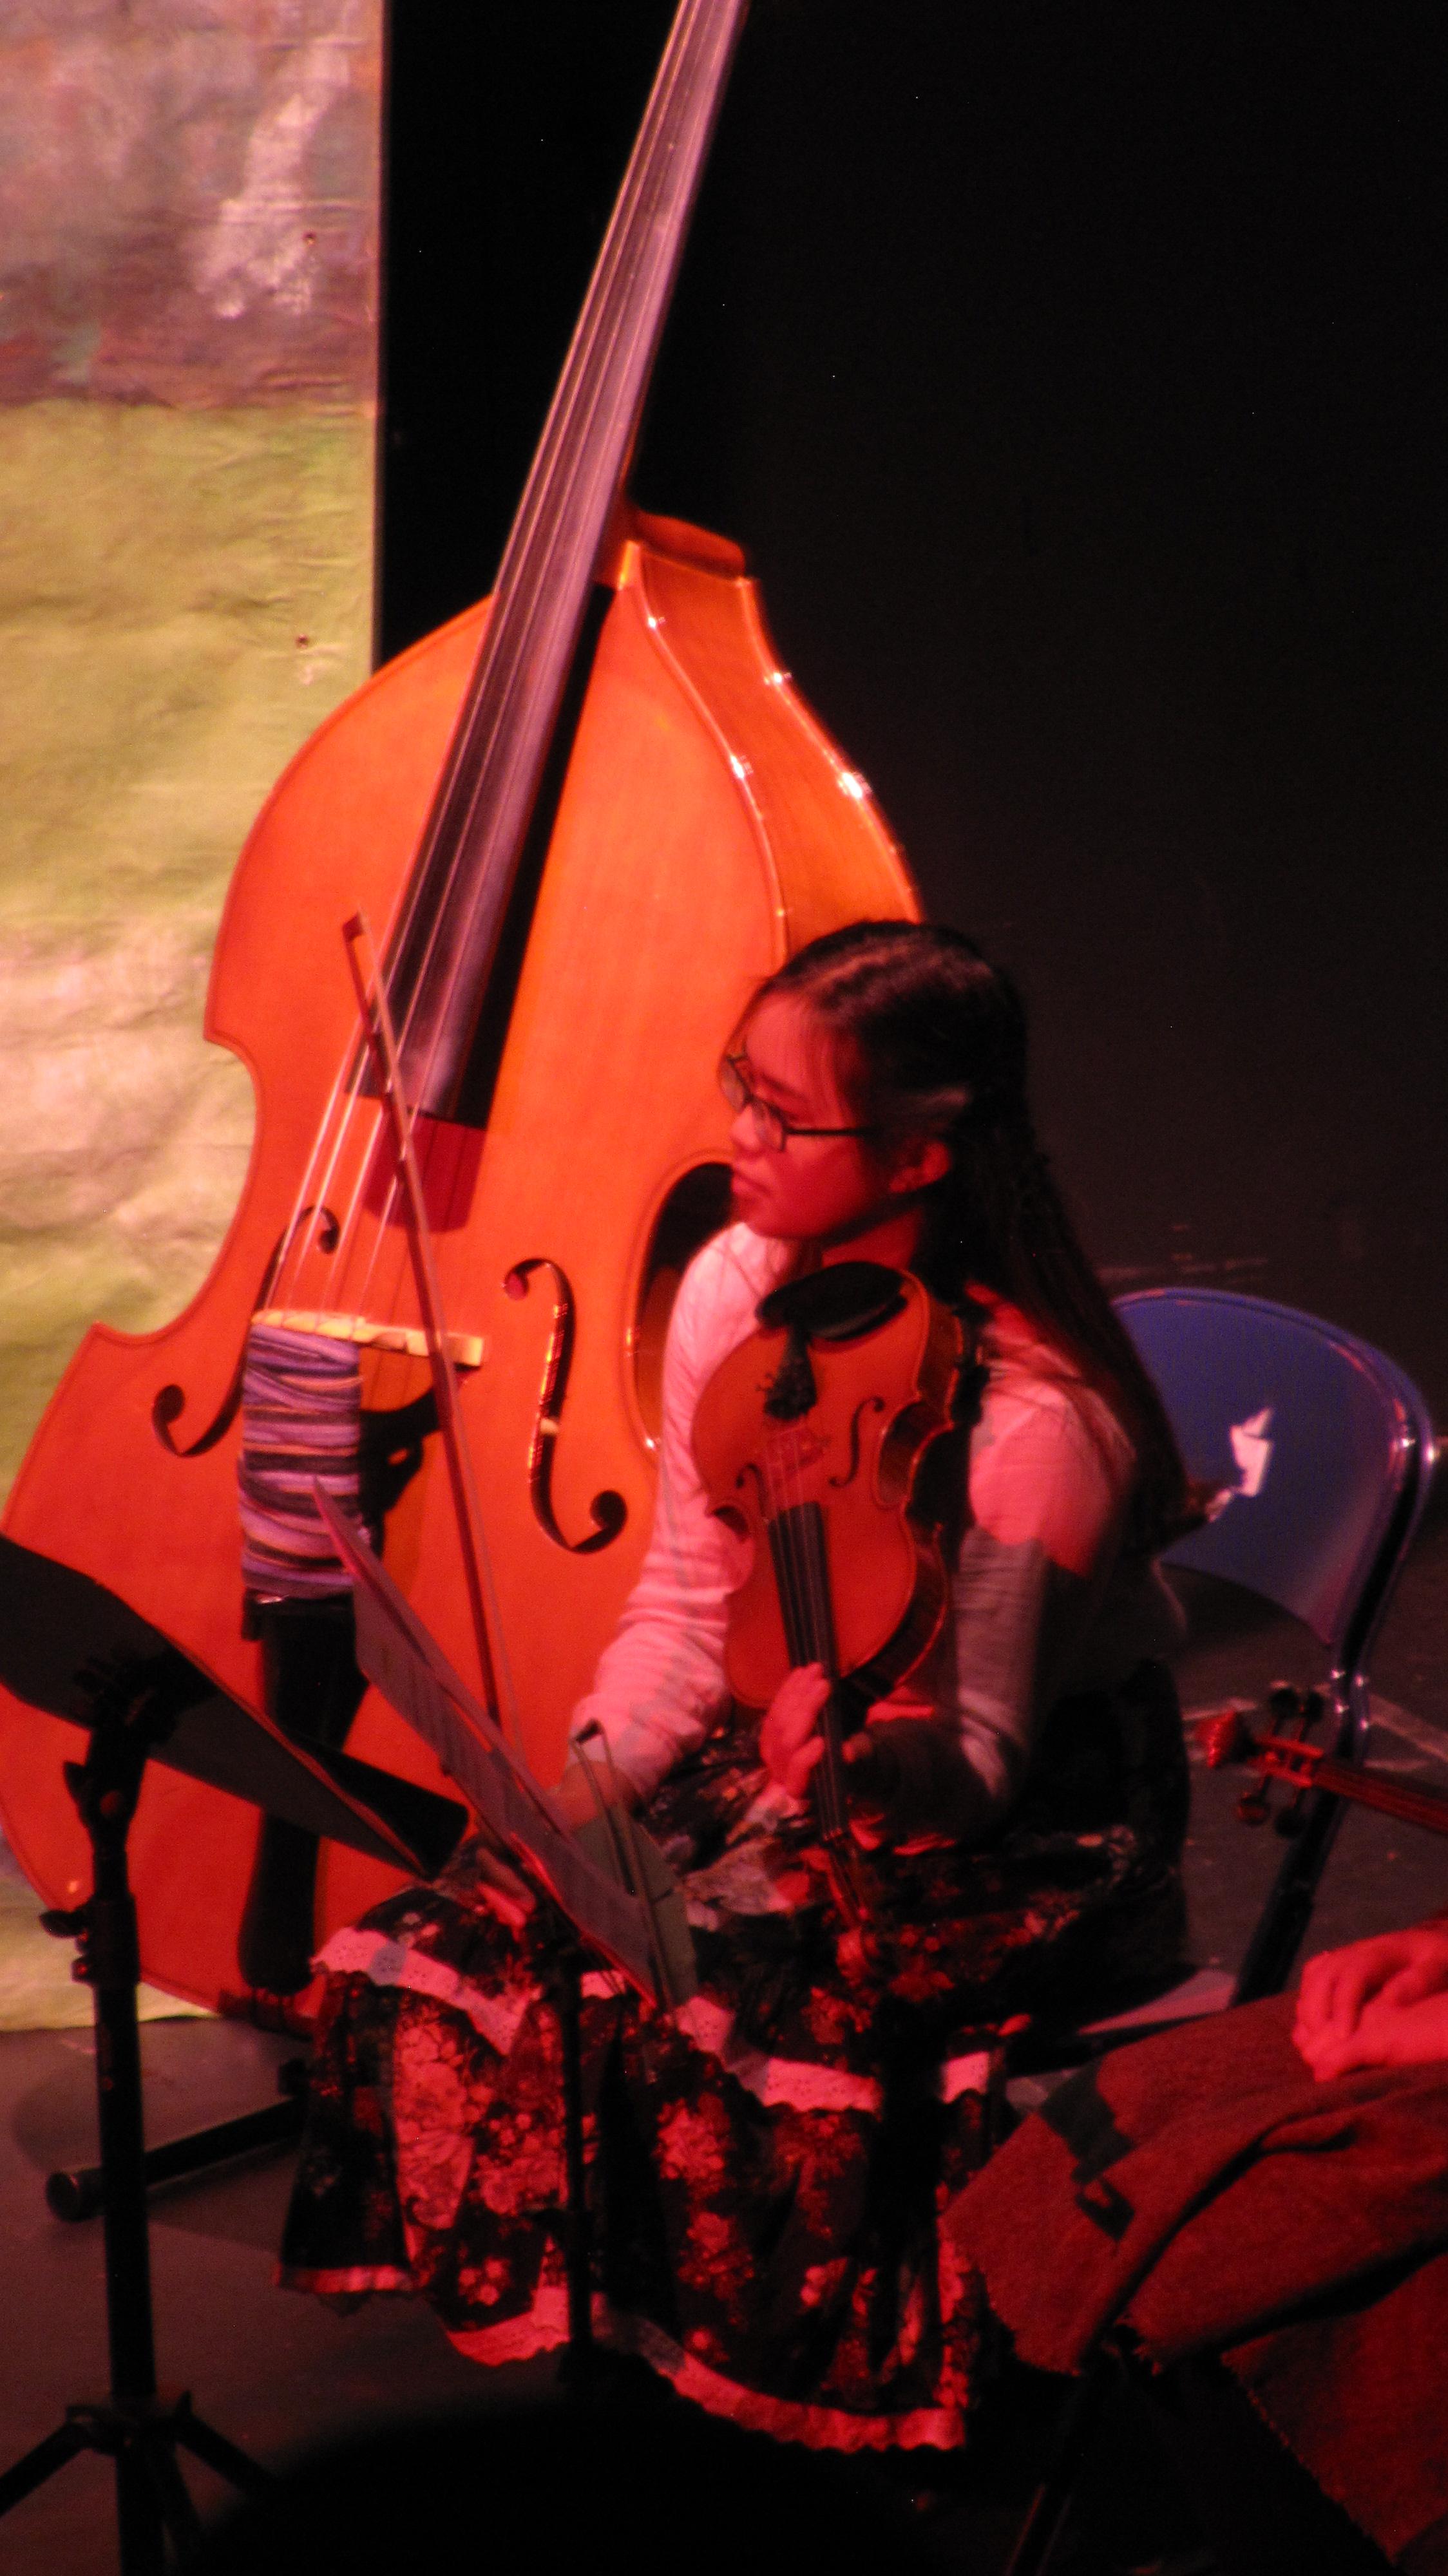 Jessica fiddle